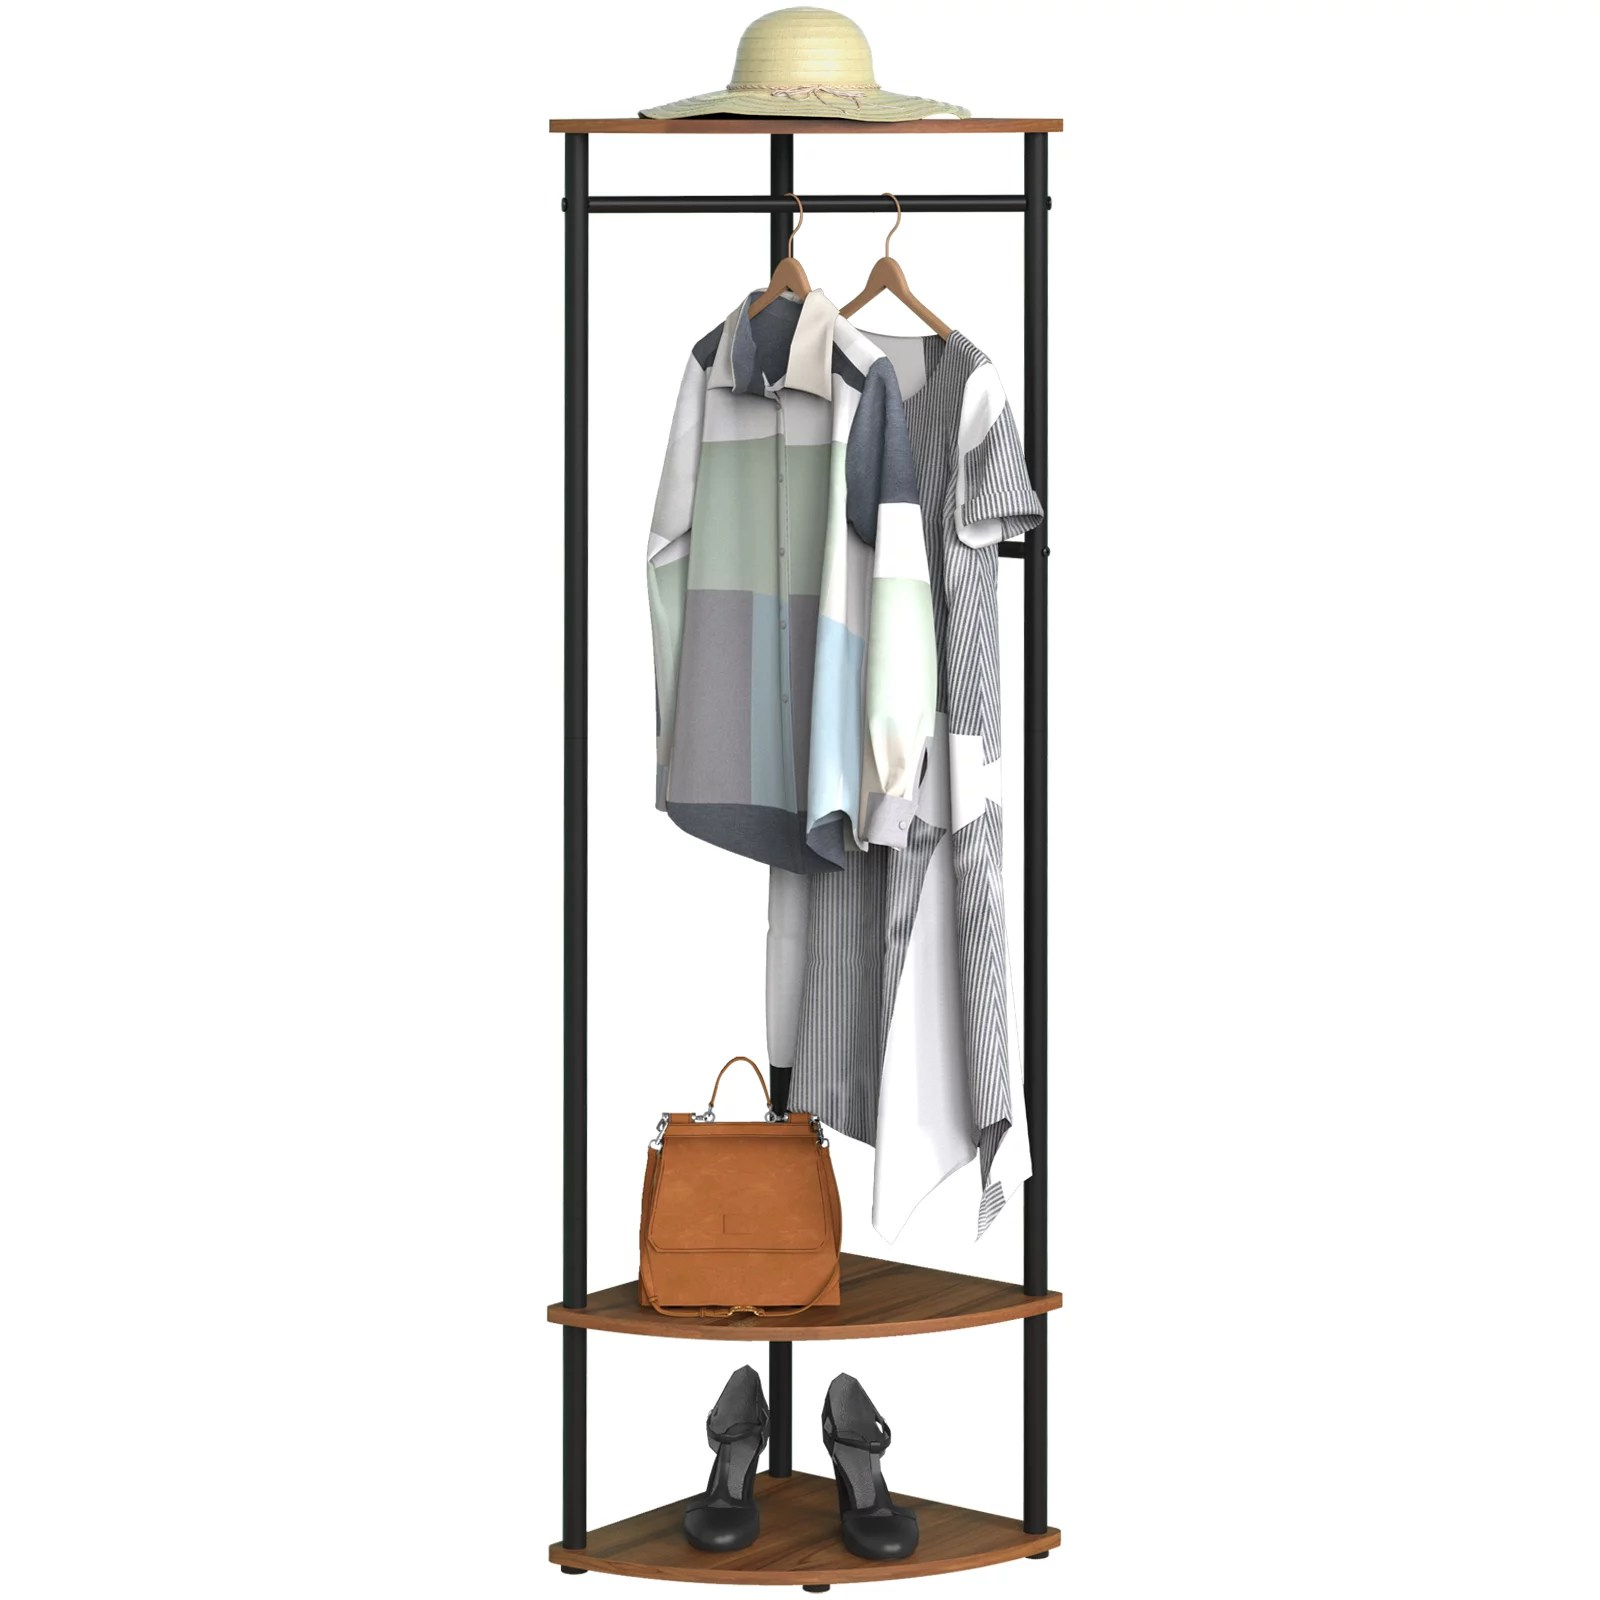 cheflaud corner hall tree coat rack with 3 shelf 4 detachable hooks for coat caps and bag